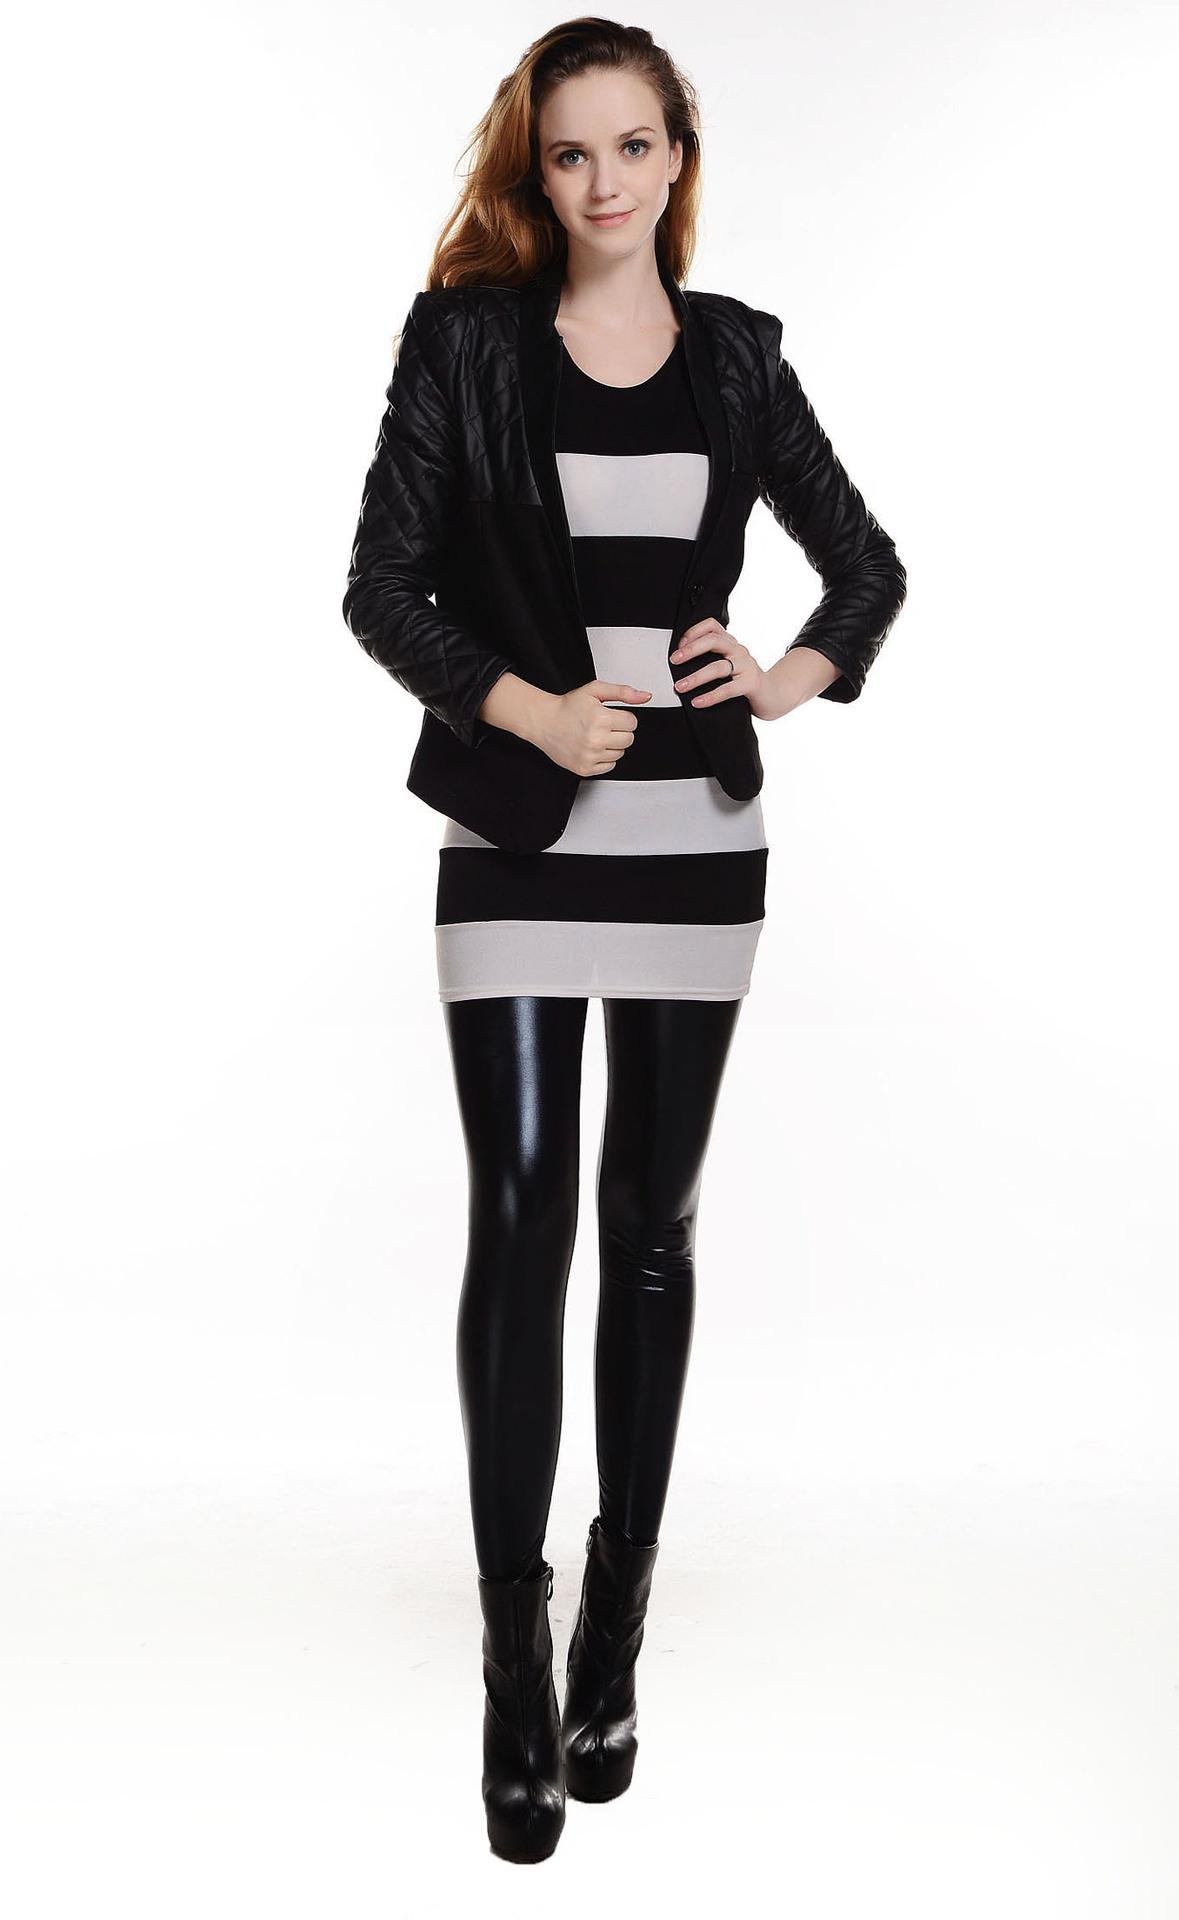 Hot Fashion Women's Sexy Shiny Metallic Leggings Liquid ...